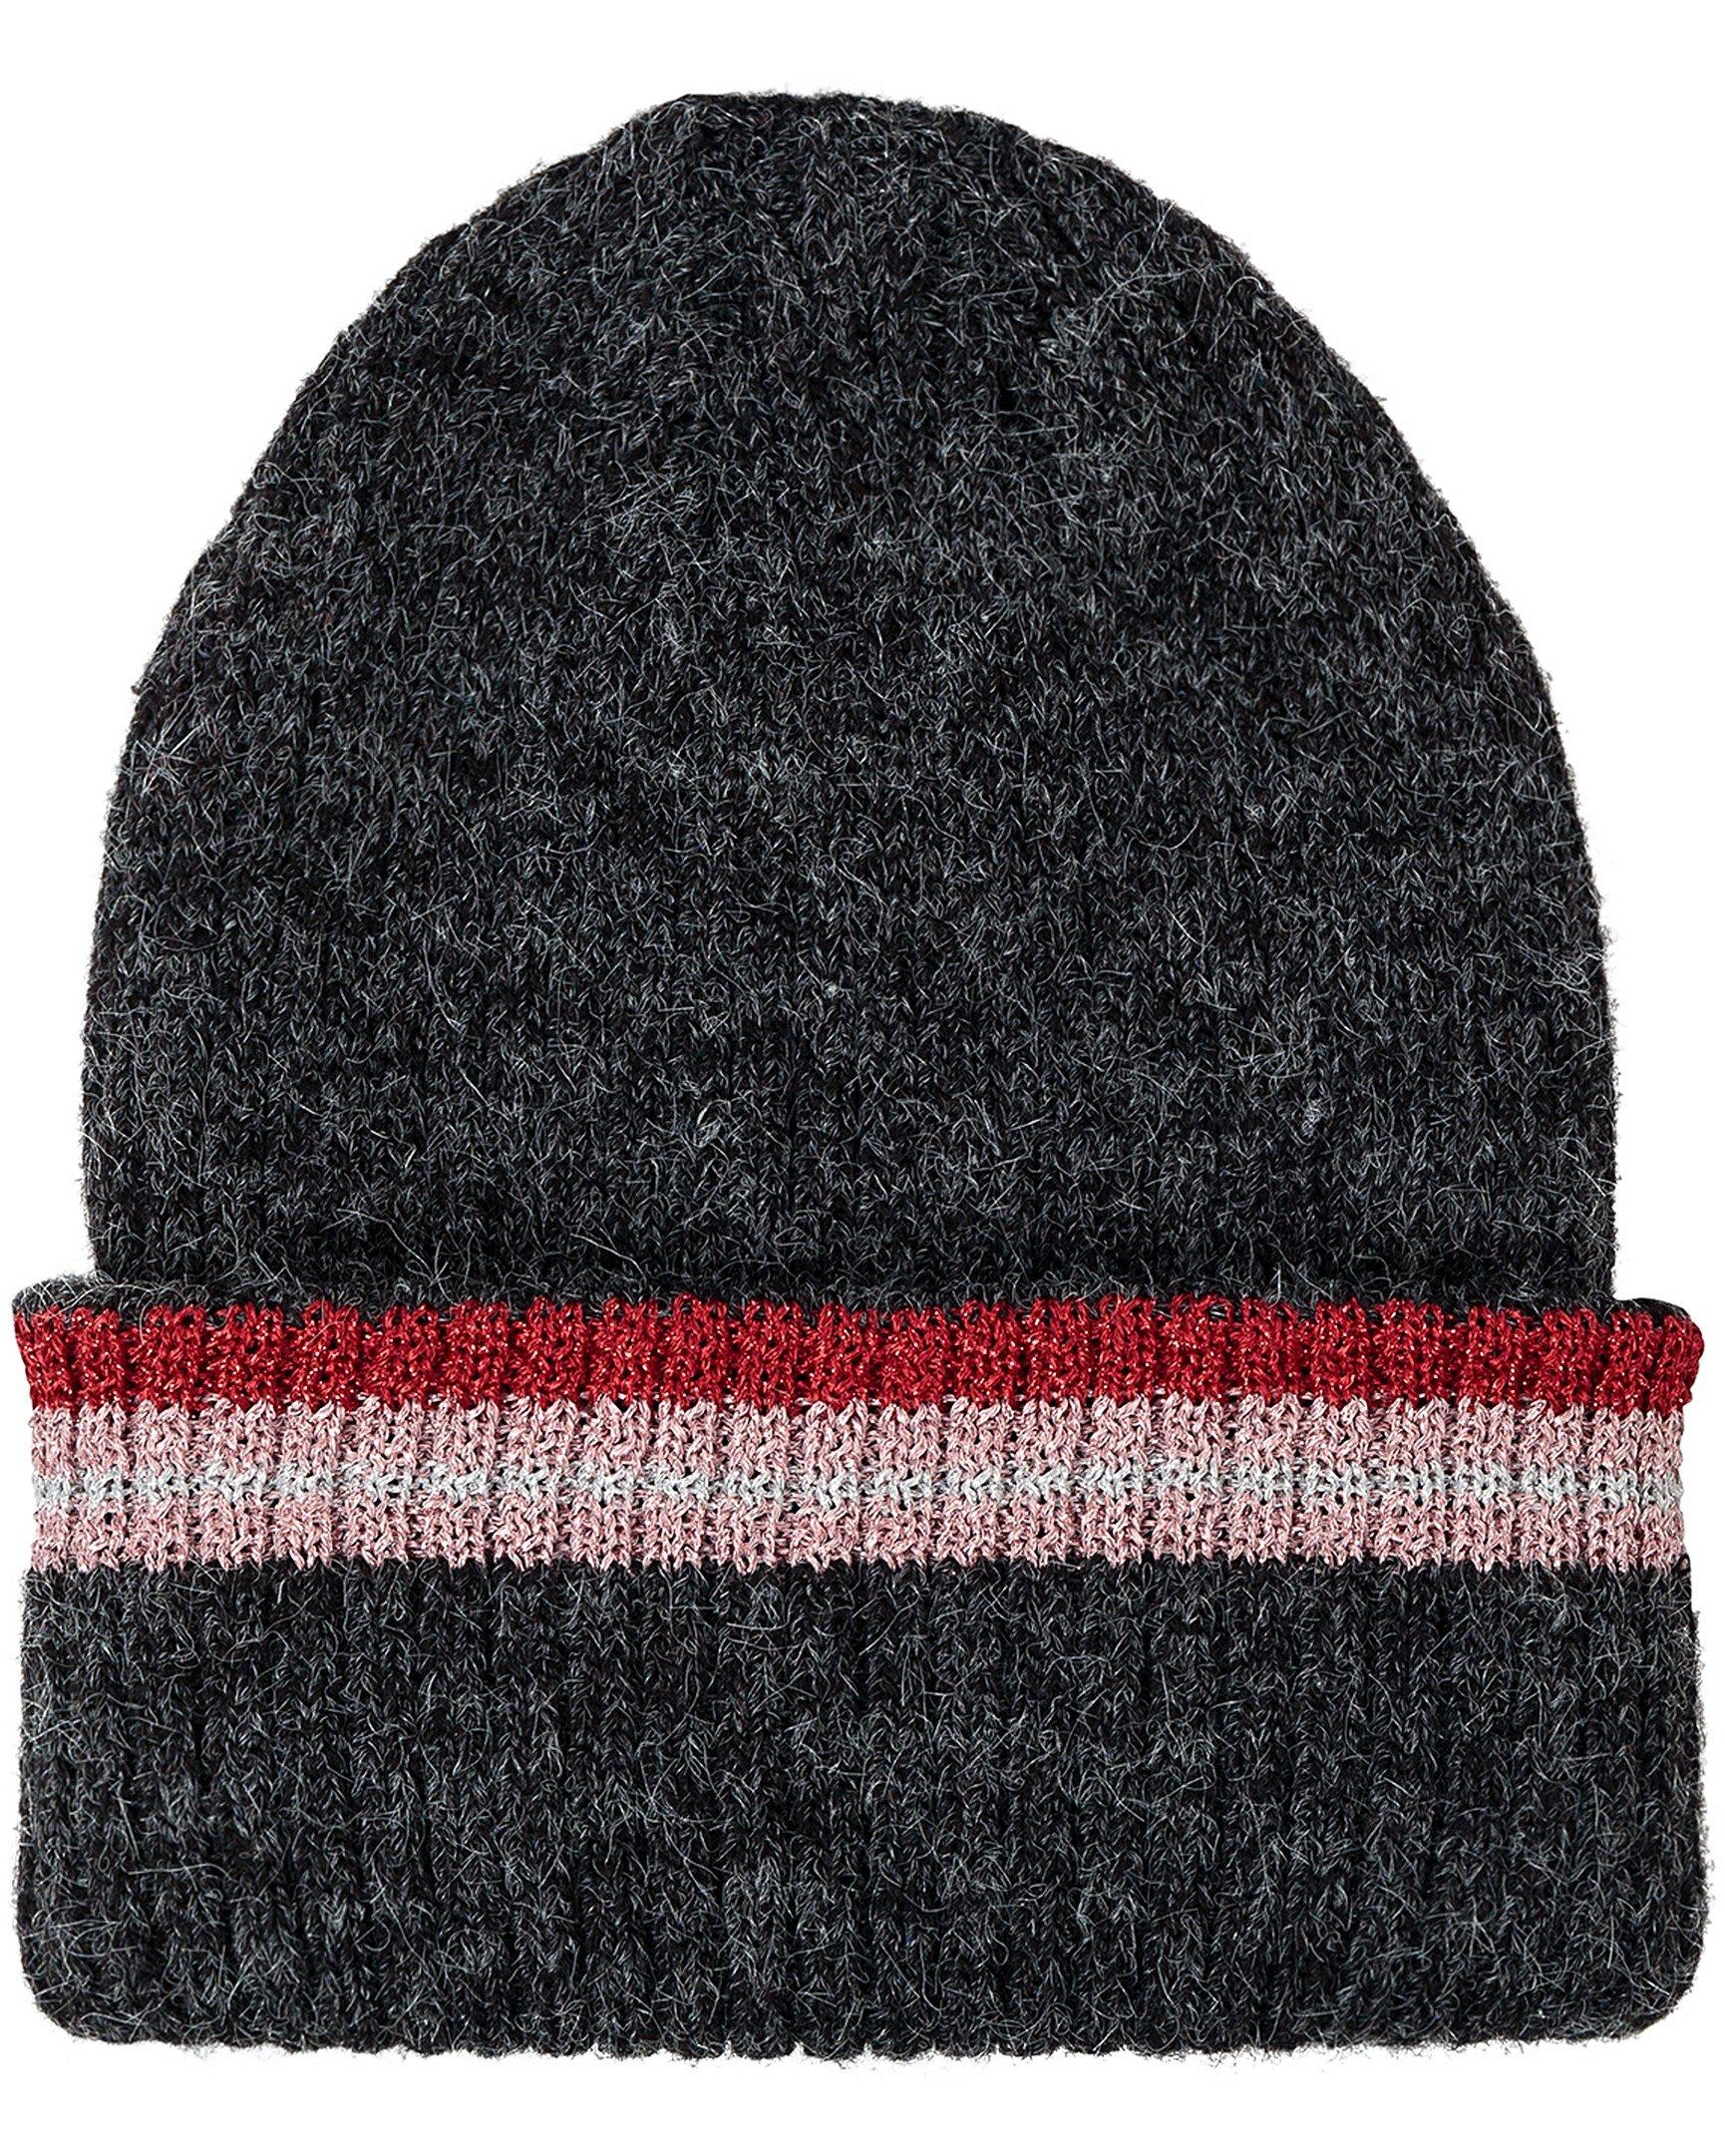 80597decaeb74 Striped Rib Turn Up Charcoal Beanie Hat